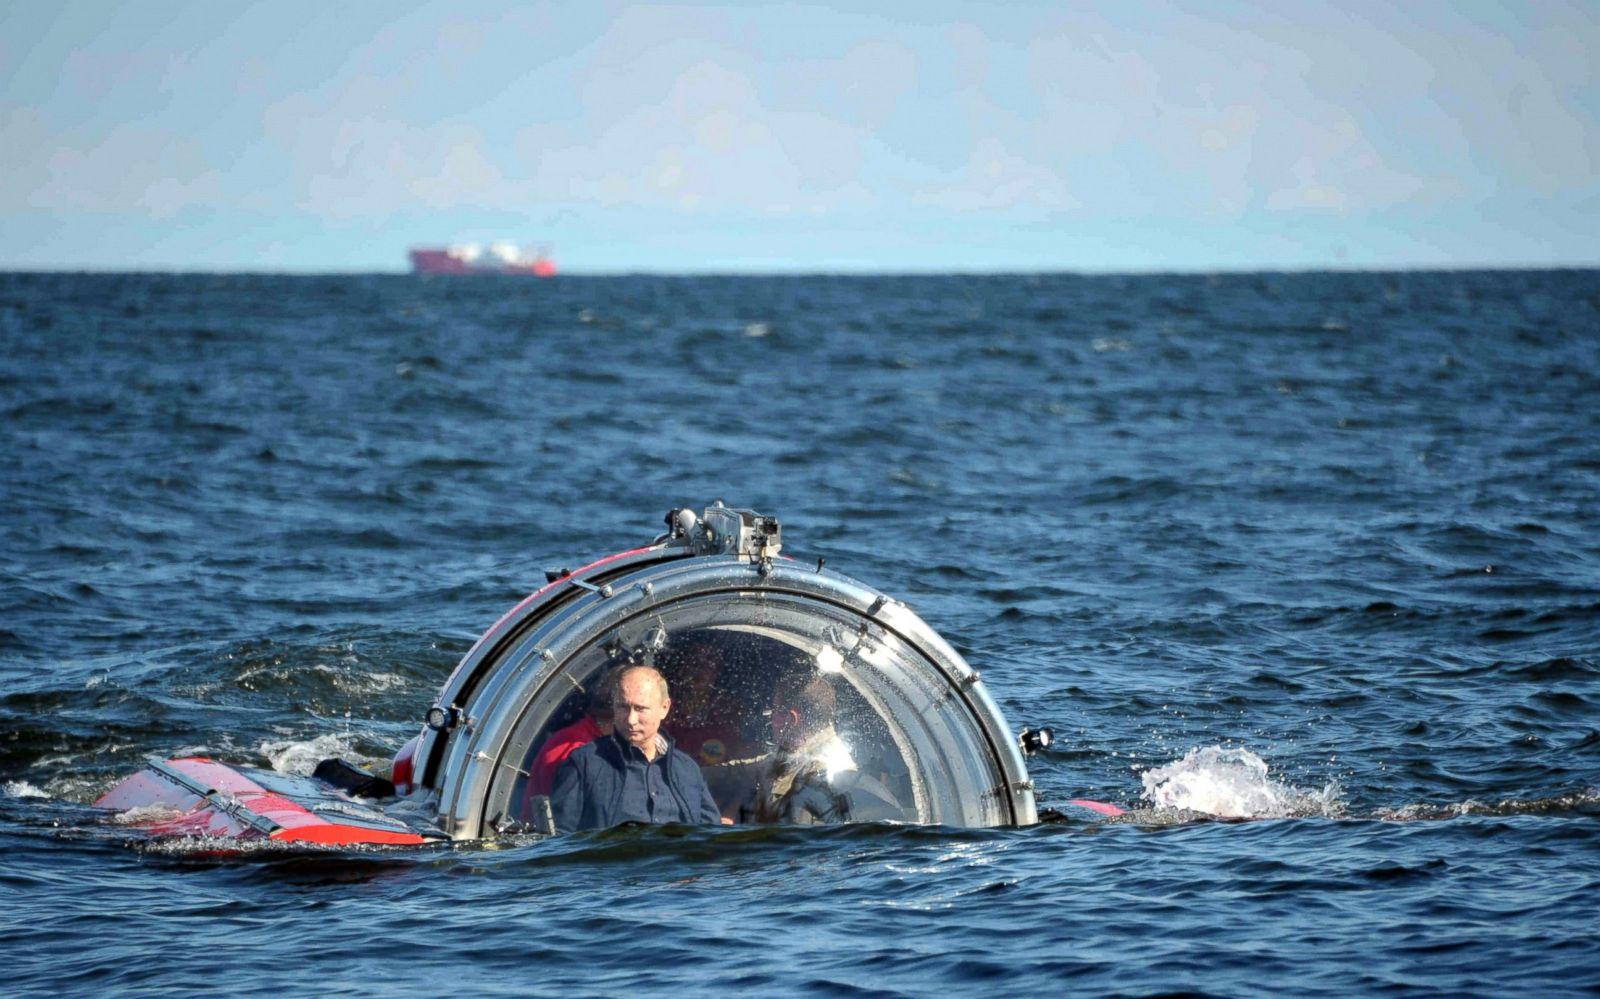 gty_putin_submarine_ocean_sk_140402_8x5_1600